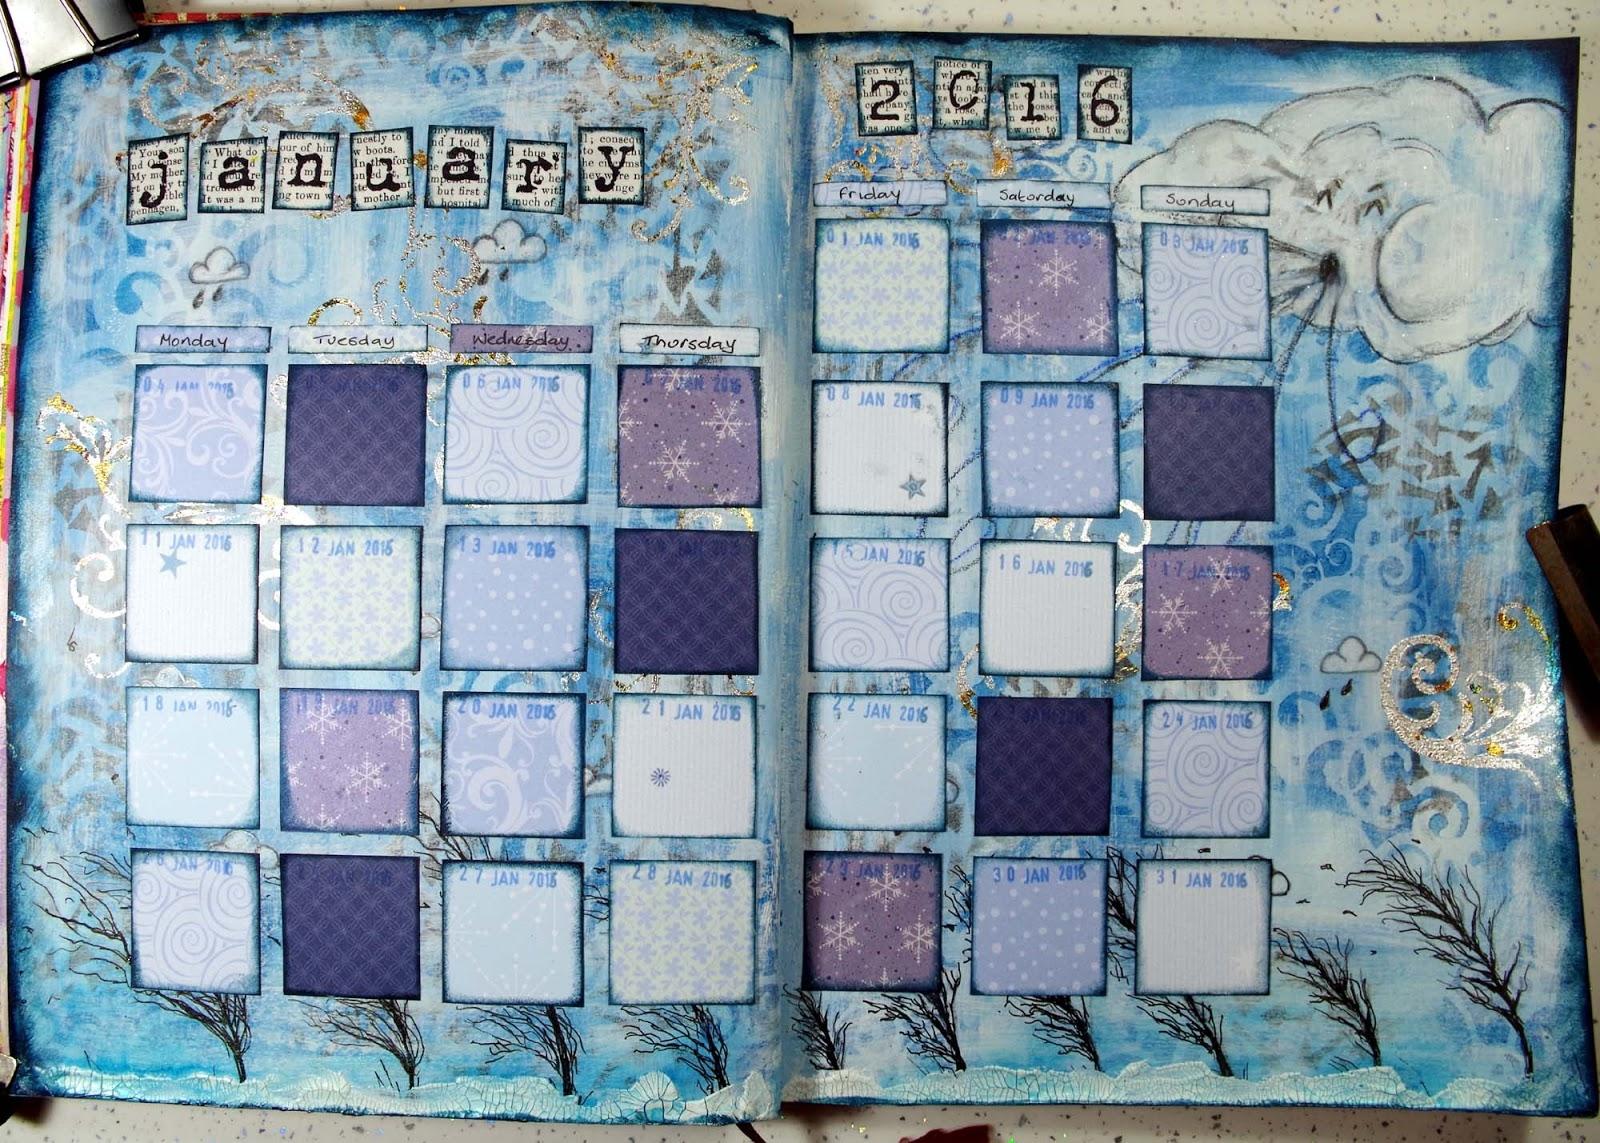 The Hob Room Michelle Webb Calendar Art Journal January 2016 89uj